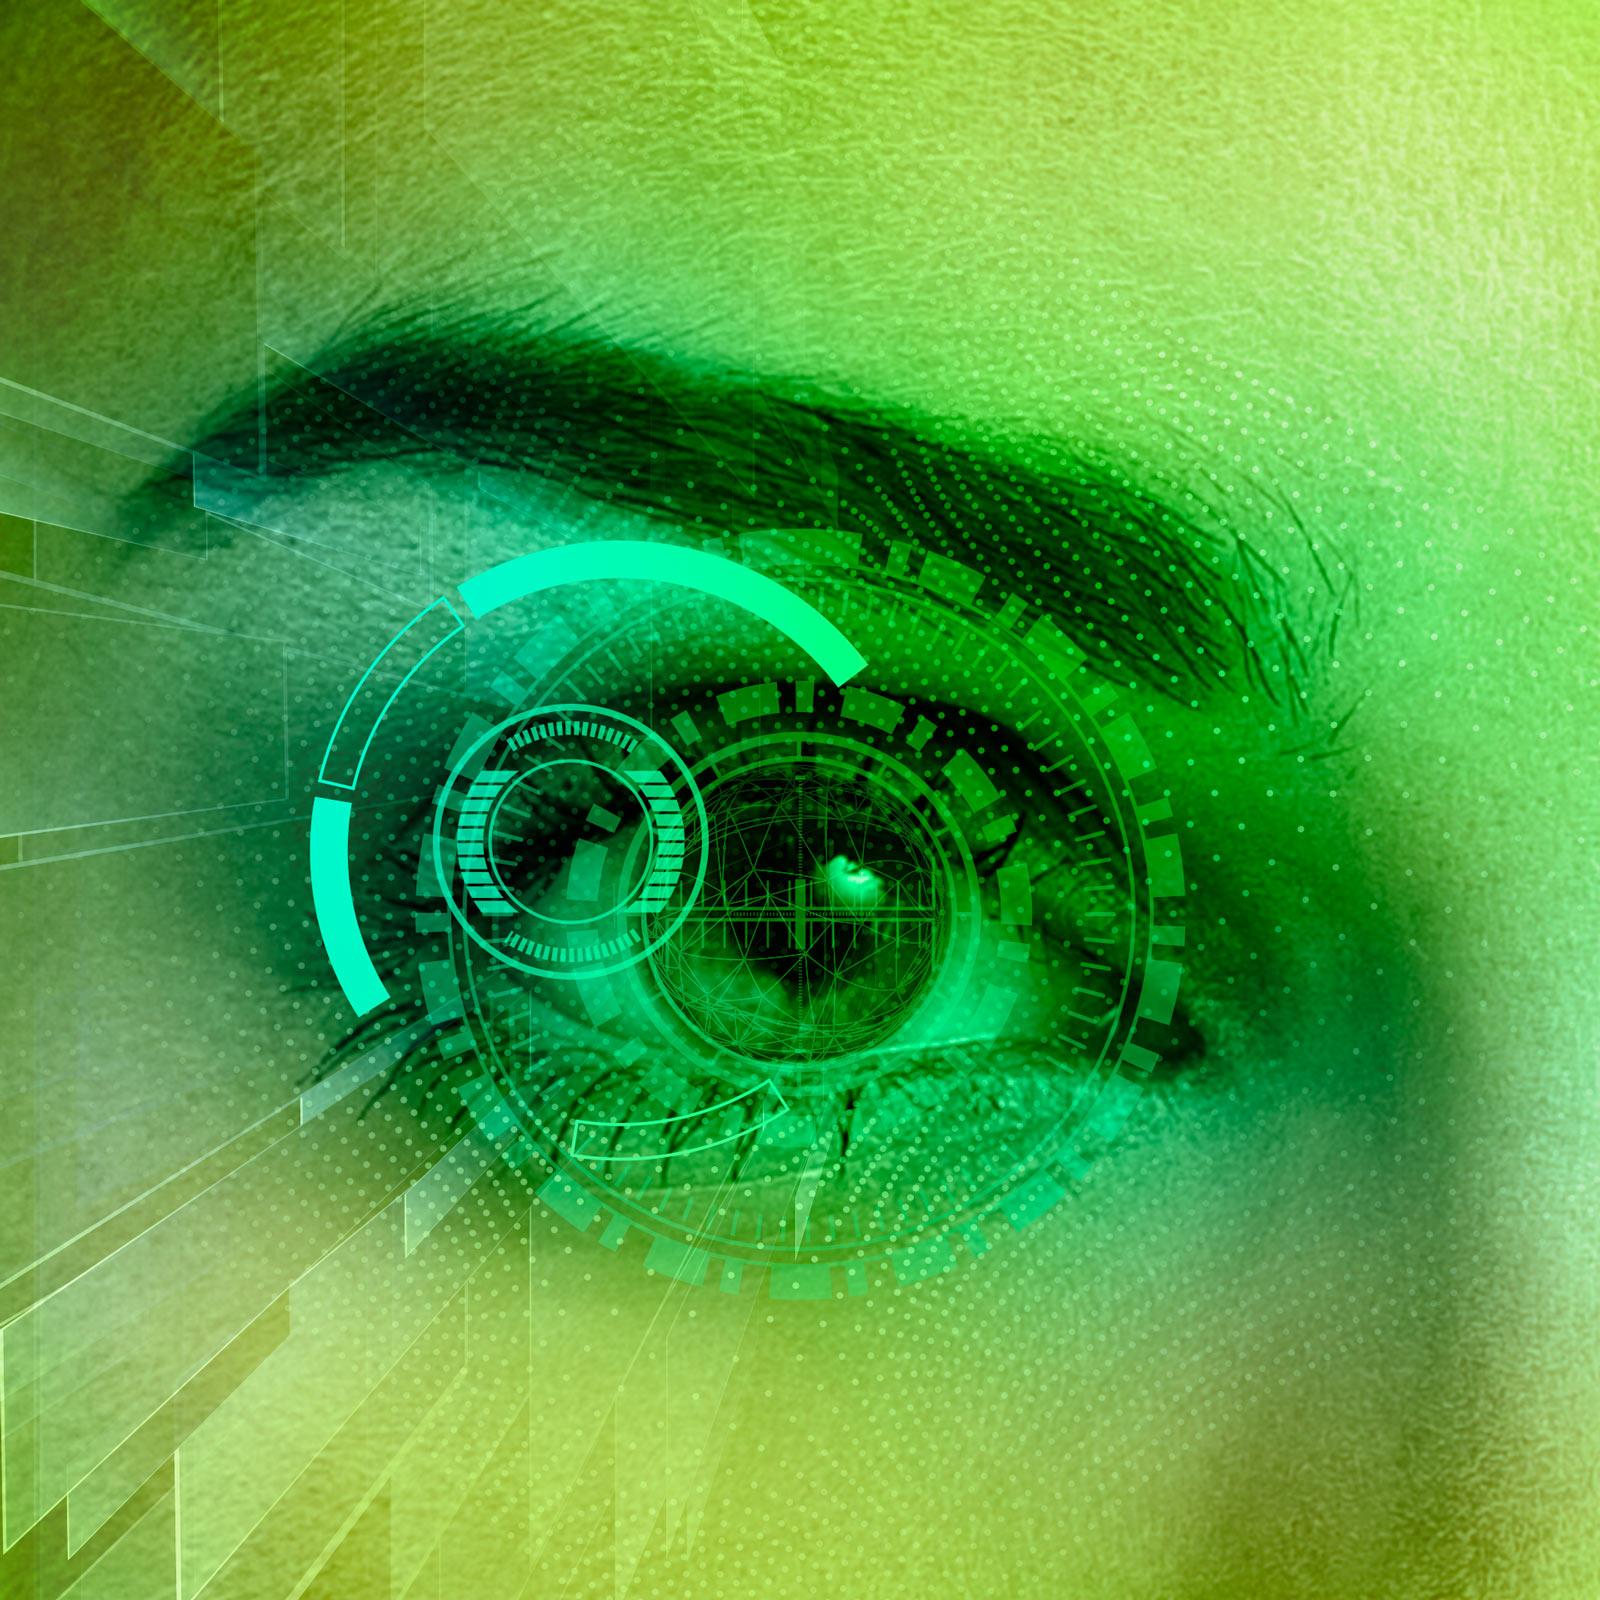 concept virtual reality vision